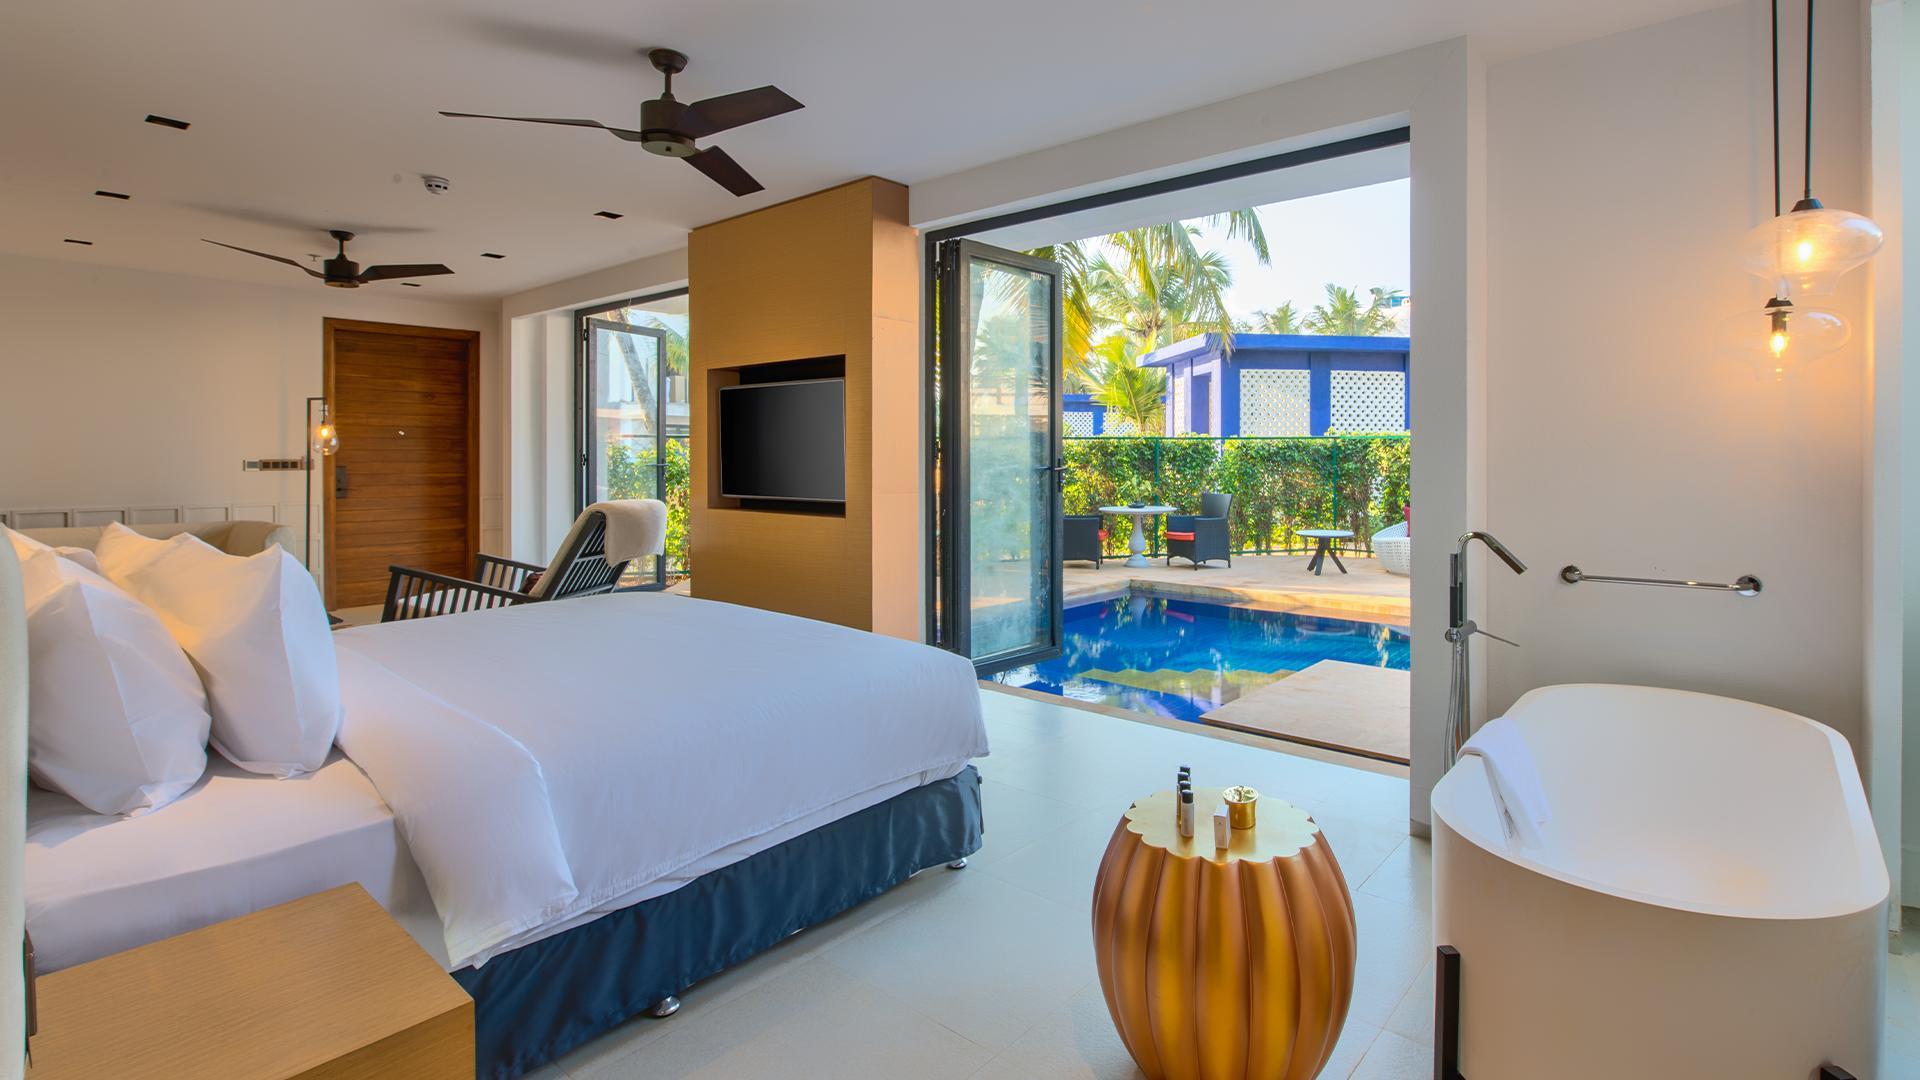 Essence Plunge Pool XL Room image 1 at Azaya Beach Resort by South Goa, Goa, India